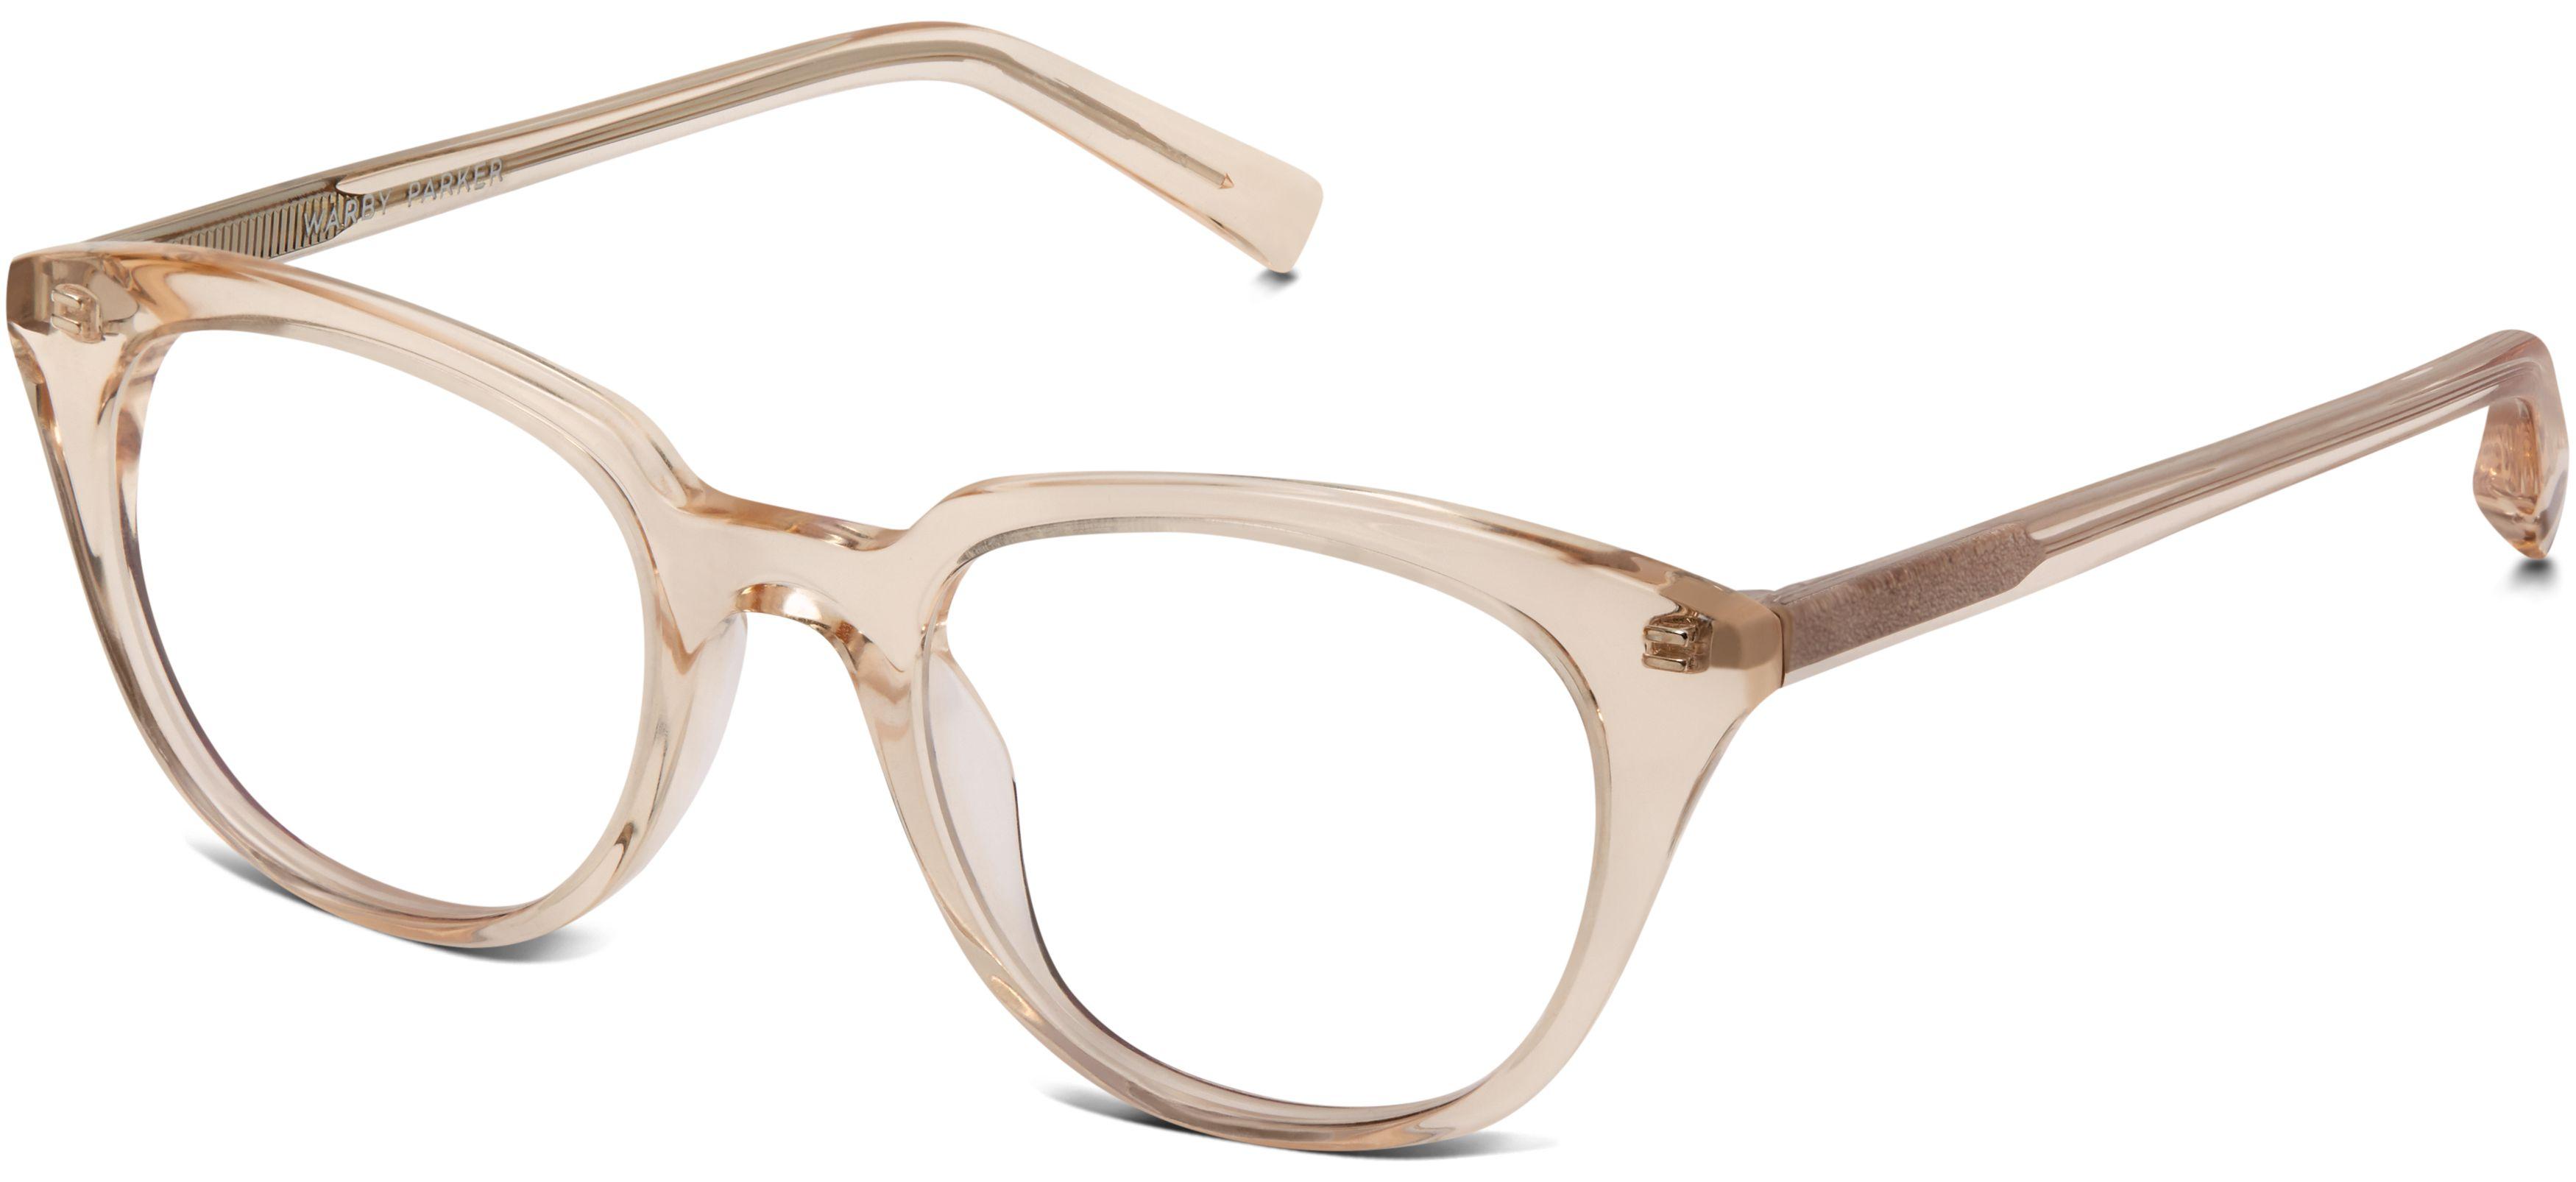 Chelsea Eyeglasses in Grapefruit Soda for Women | Warby Parker